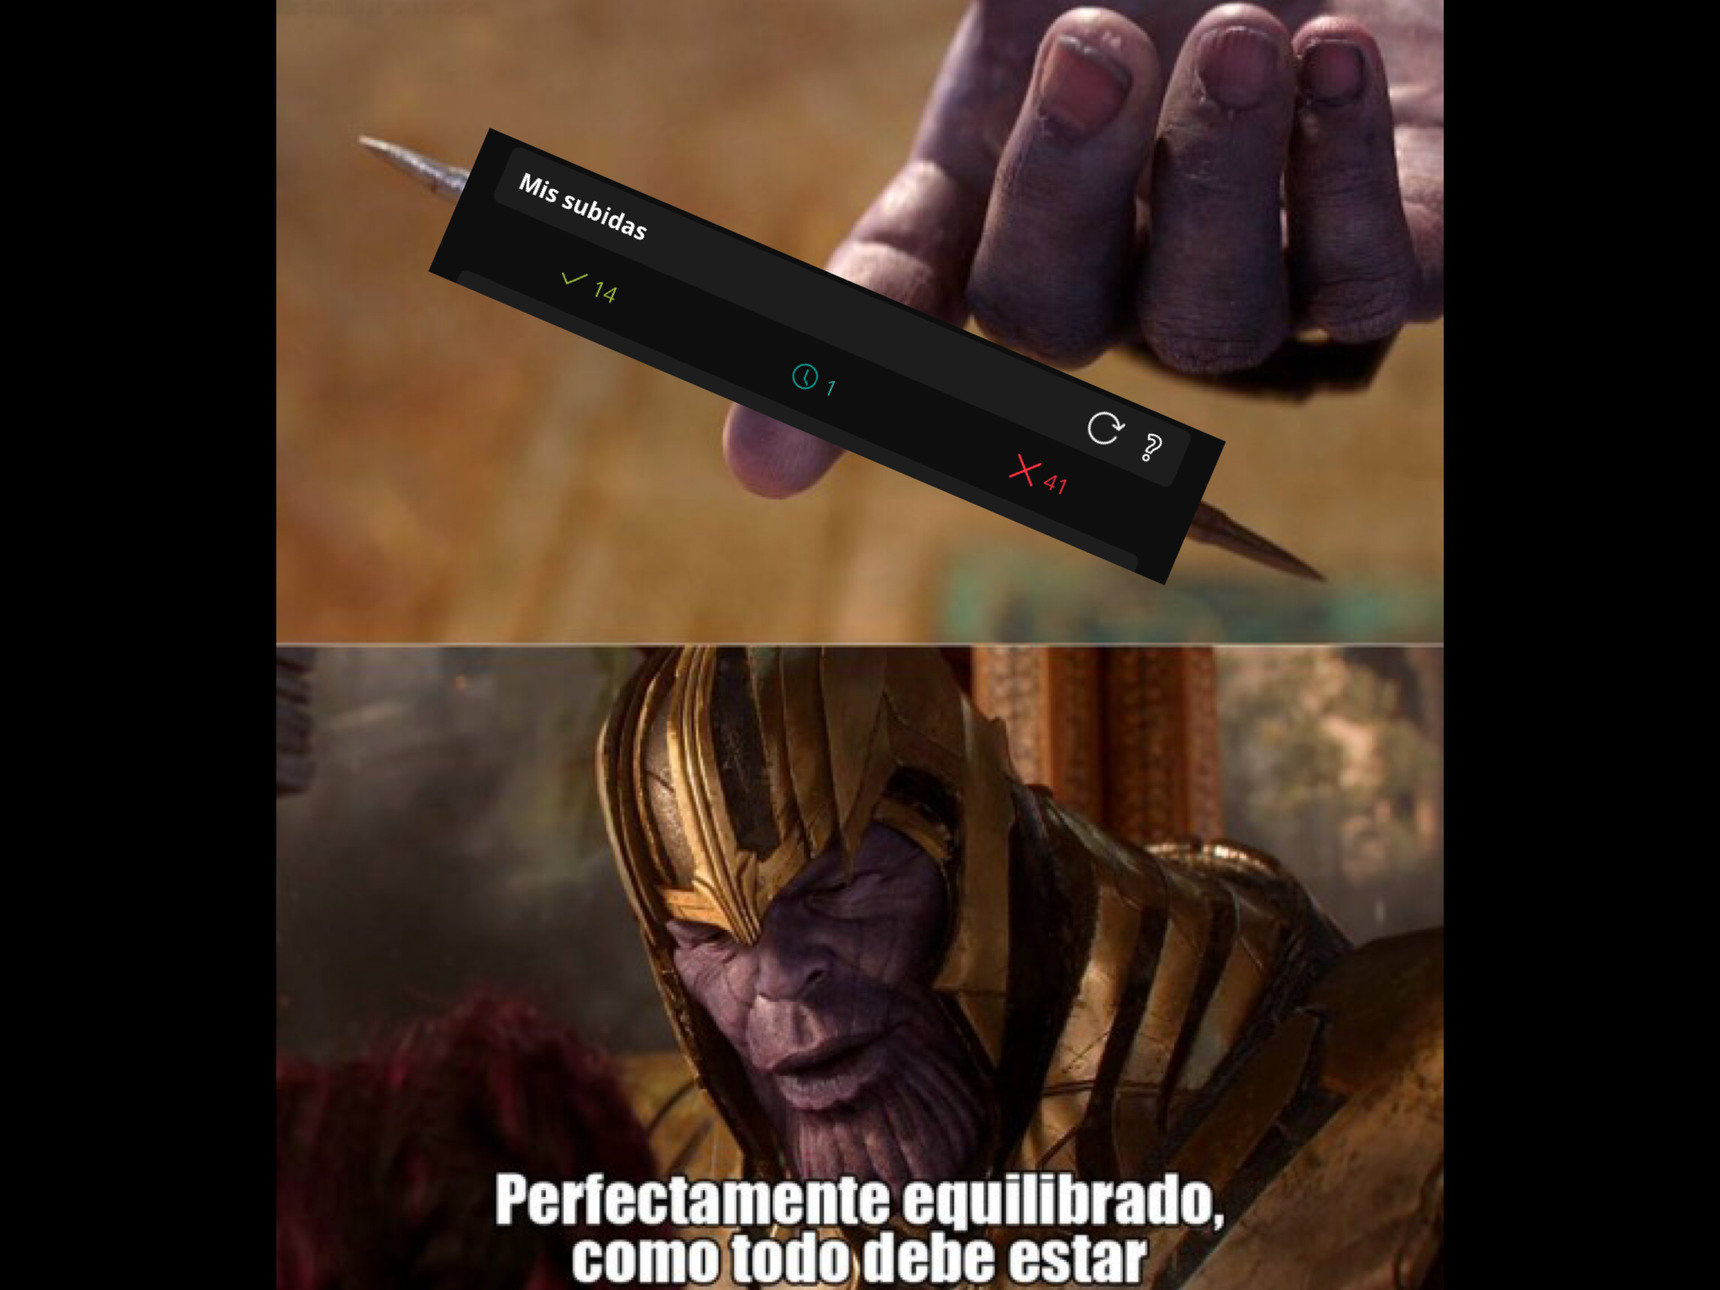 14 1 41 - meme